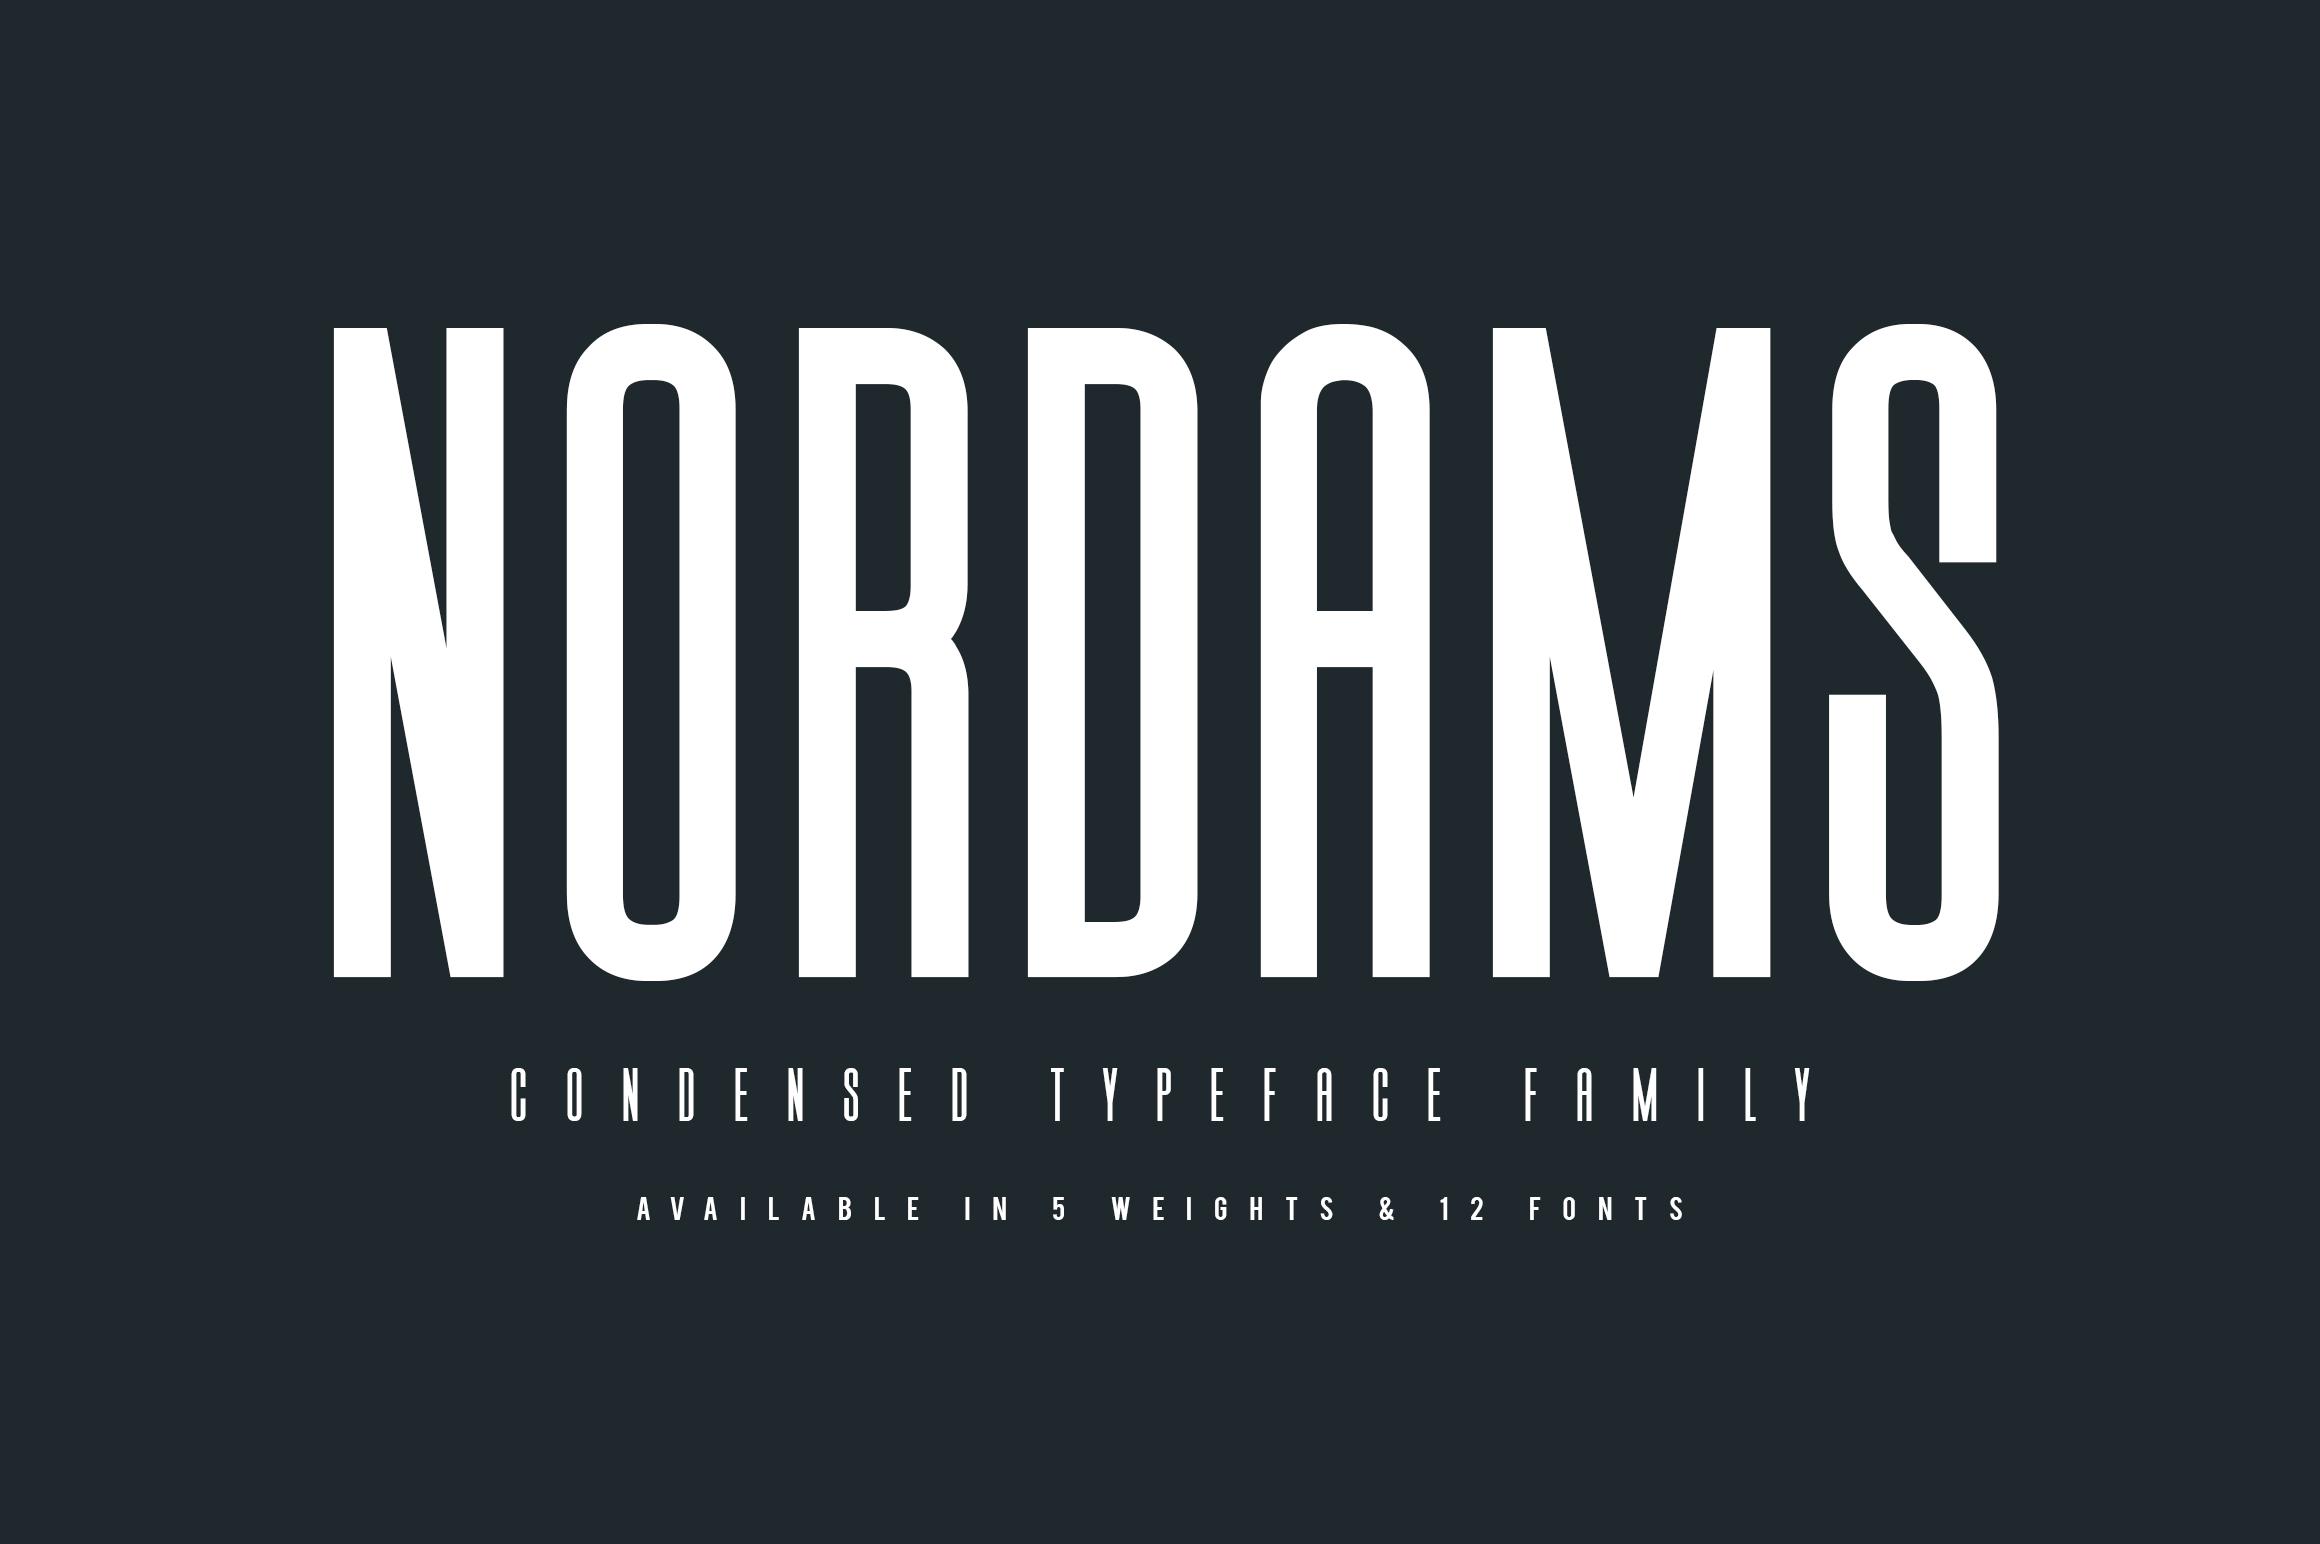 NORDAMS - Sans Serif example image 1